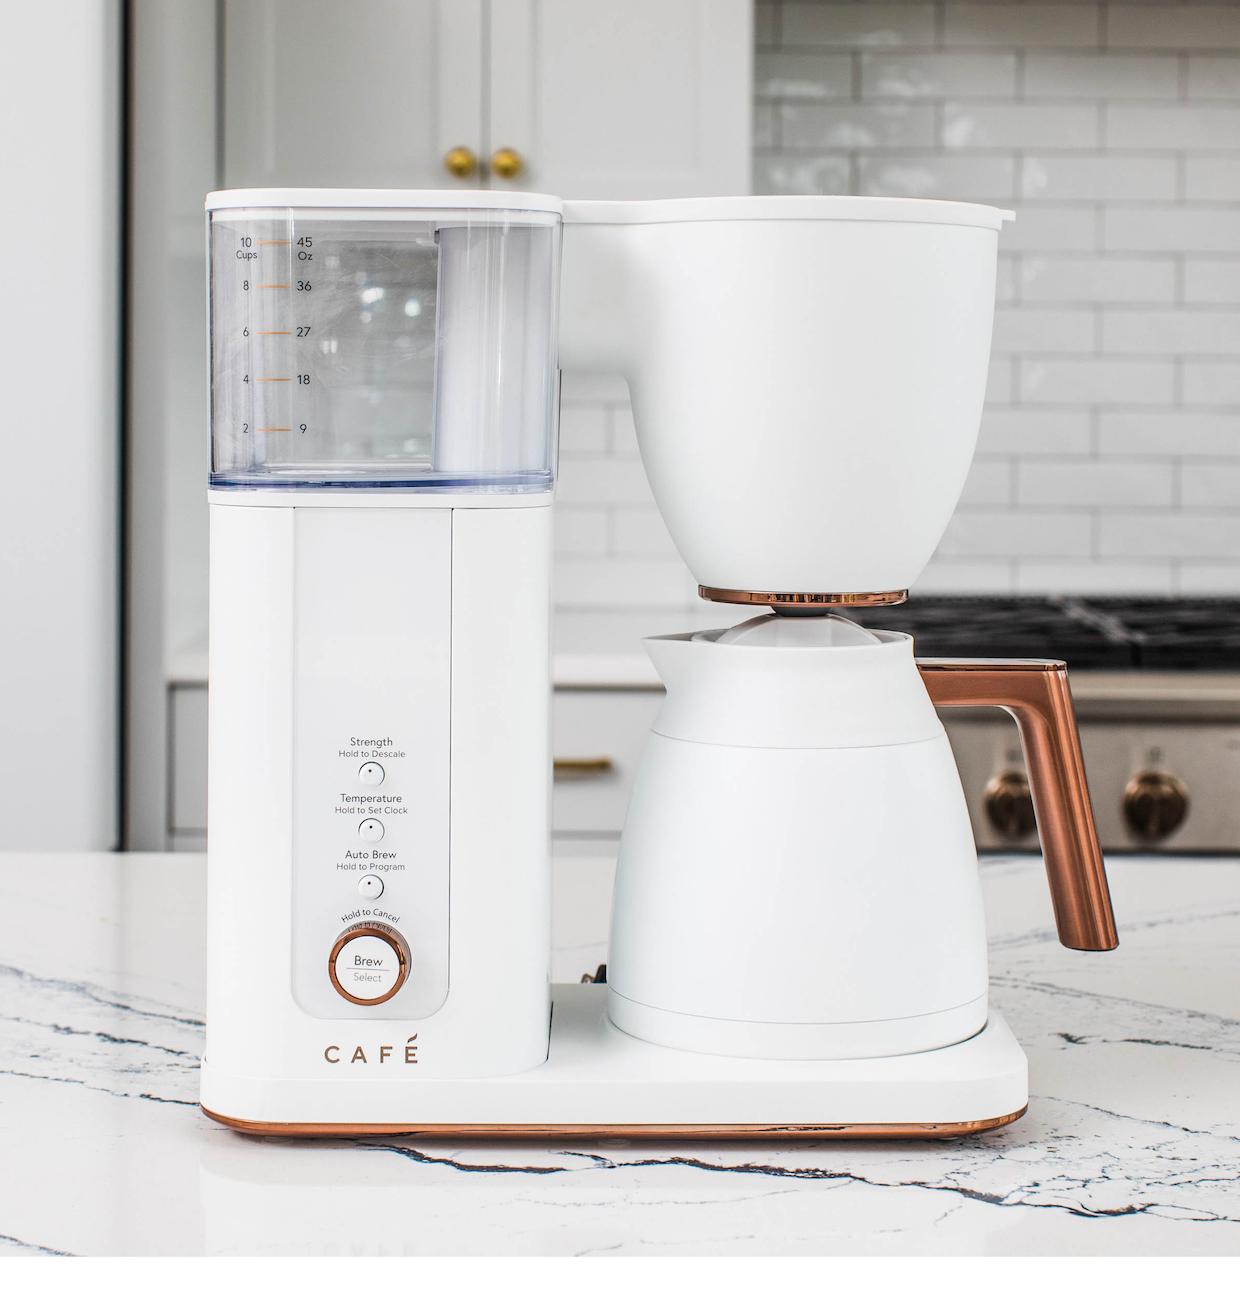 CAFÉ Specialty Drip Coffee Maker 5